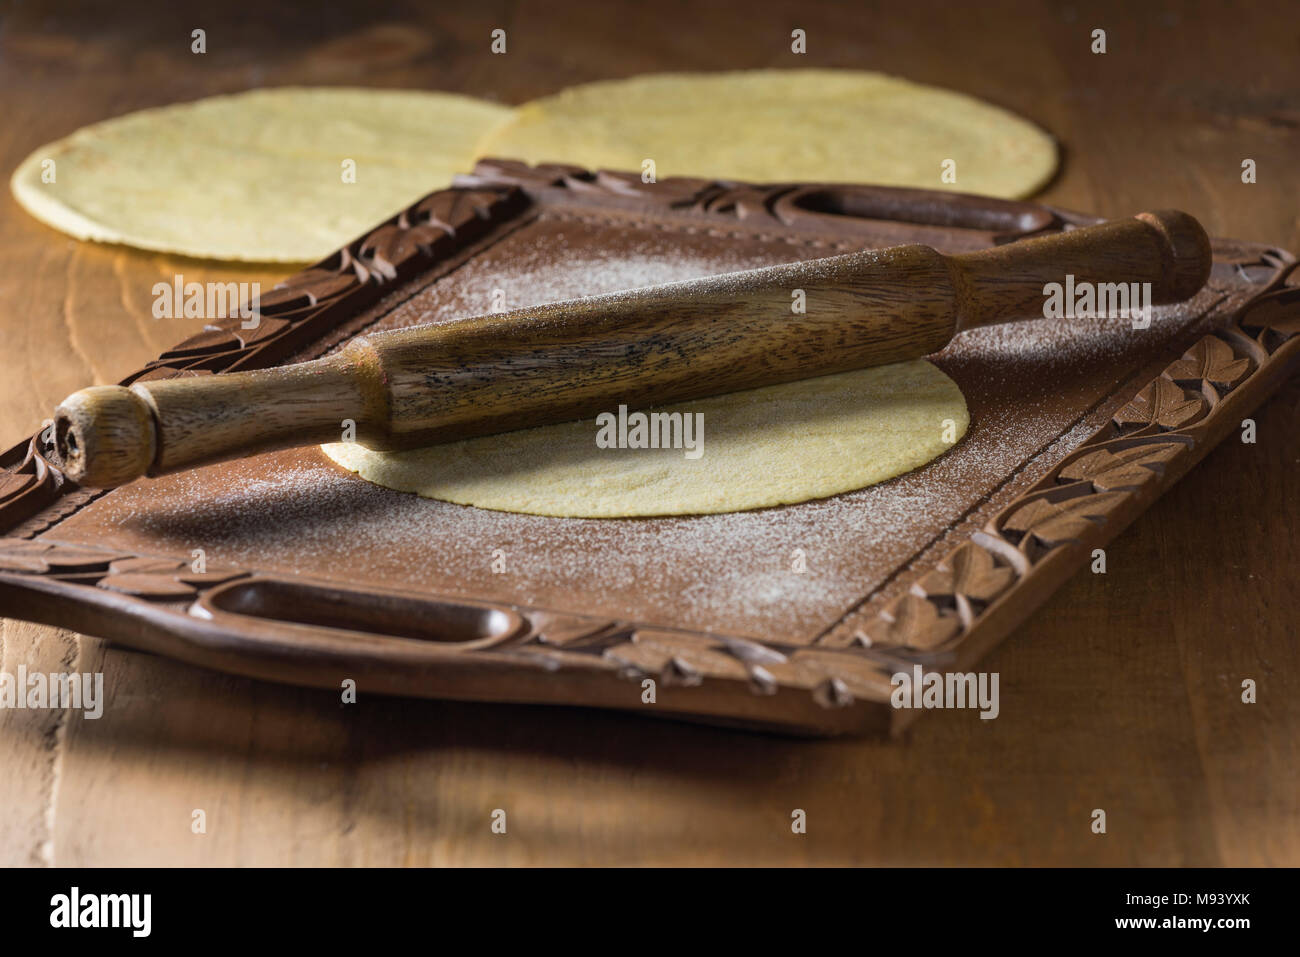 Chapatis. Indian unleavened flatbread. India Food - Stock Image